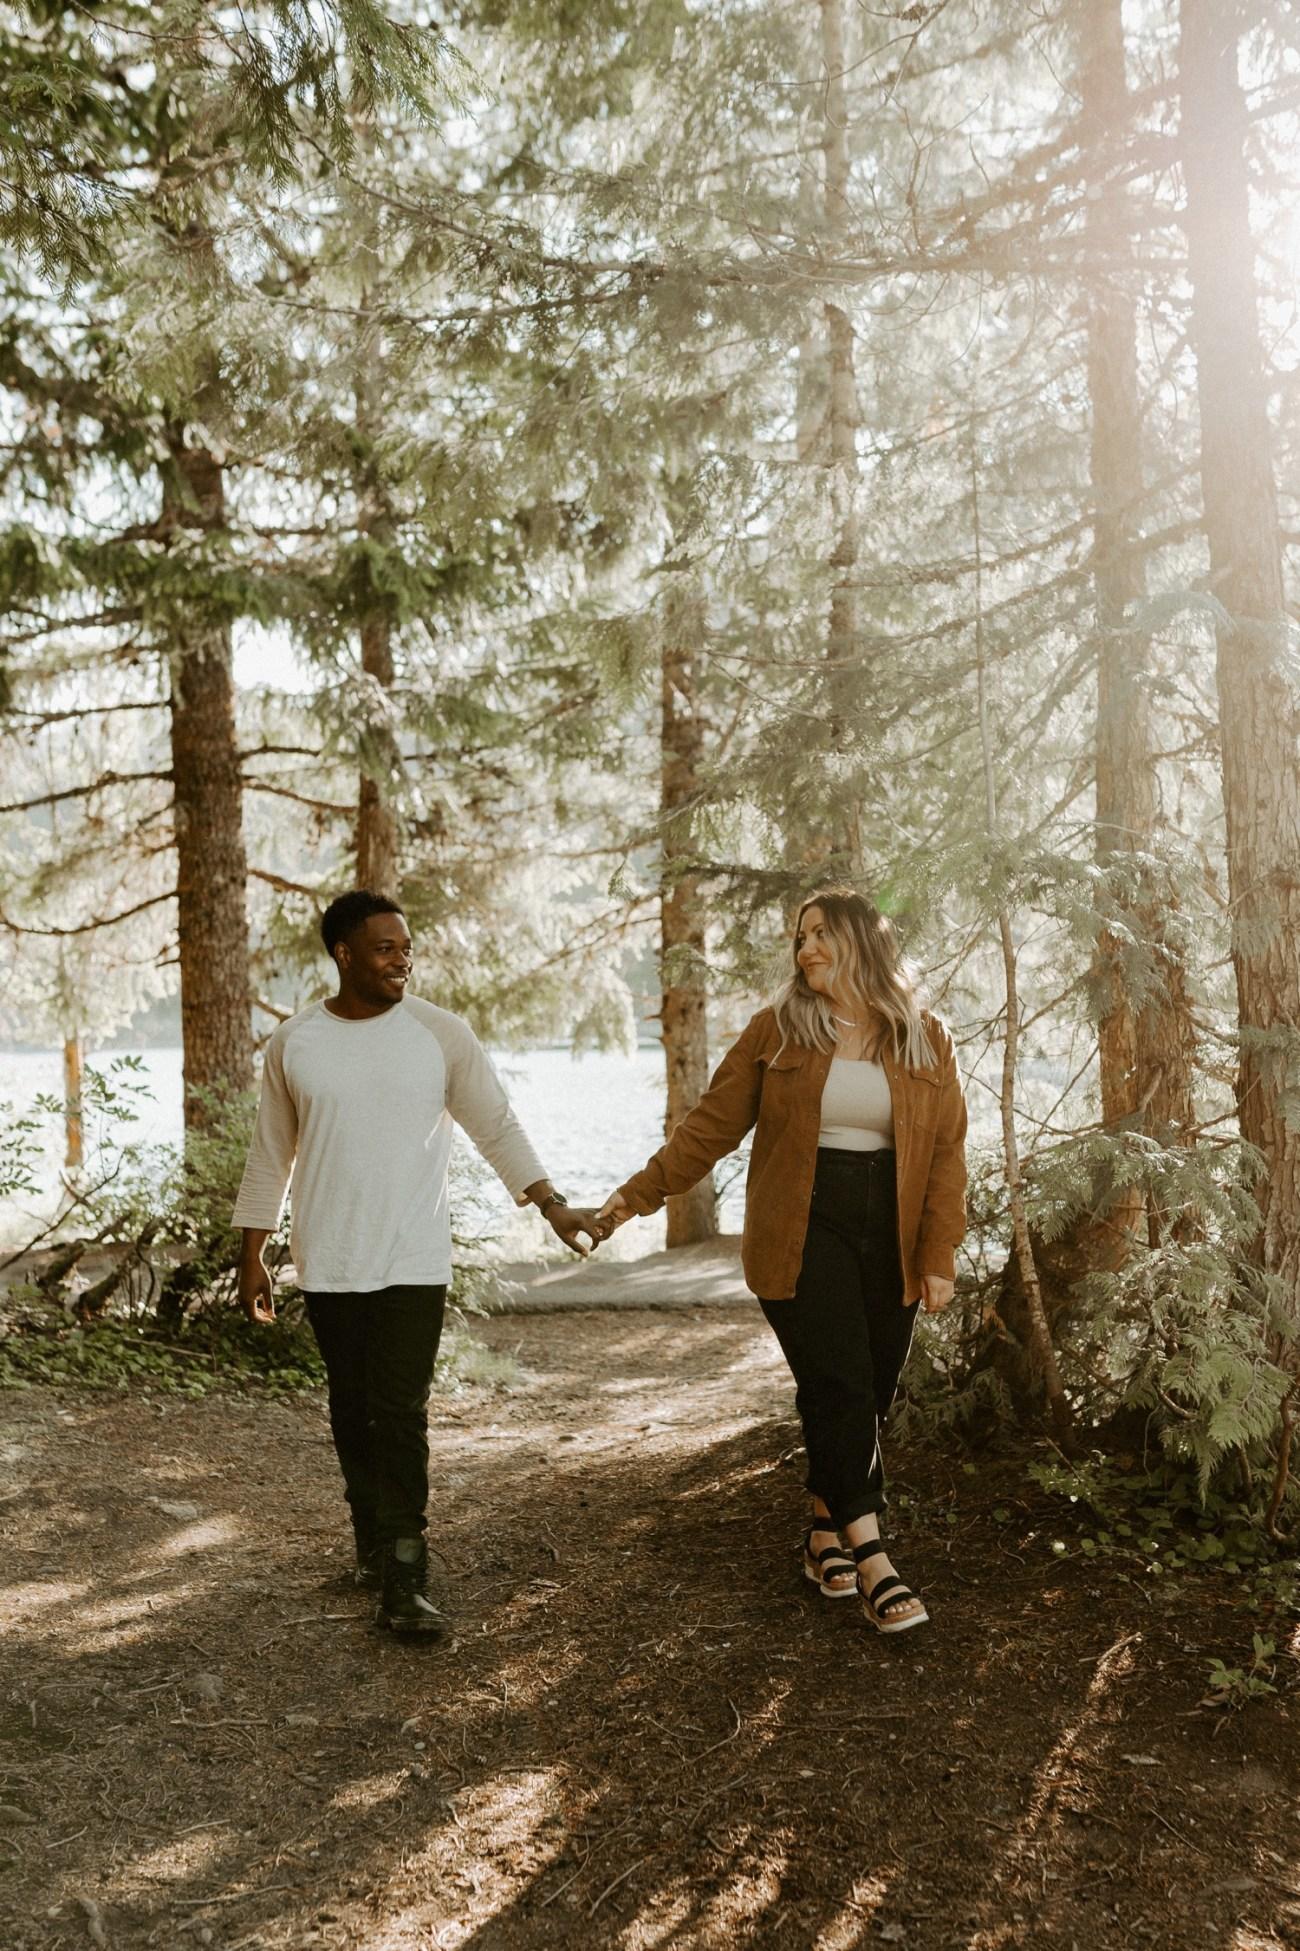 Trillium Lake Mount Hood Couple Session Engagement Session Portland Wedding Photographer Bend Elopement Photographer Anais Possamai Photography 004